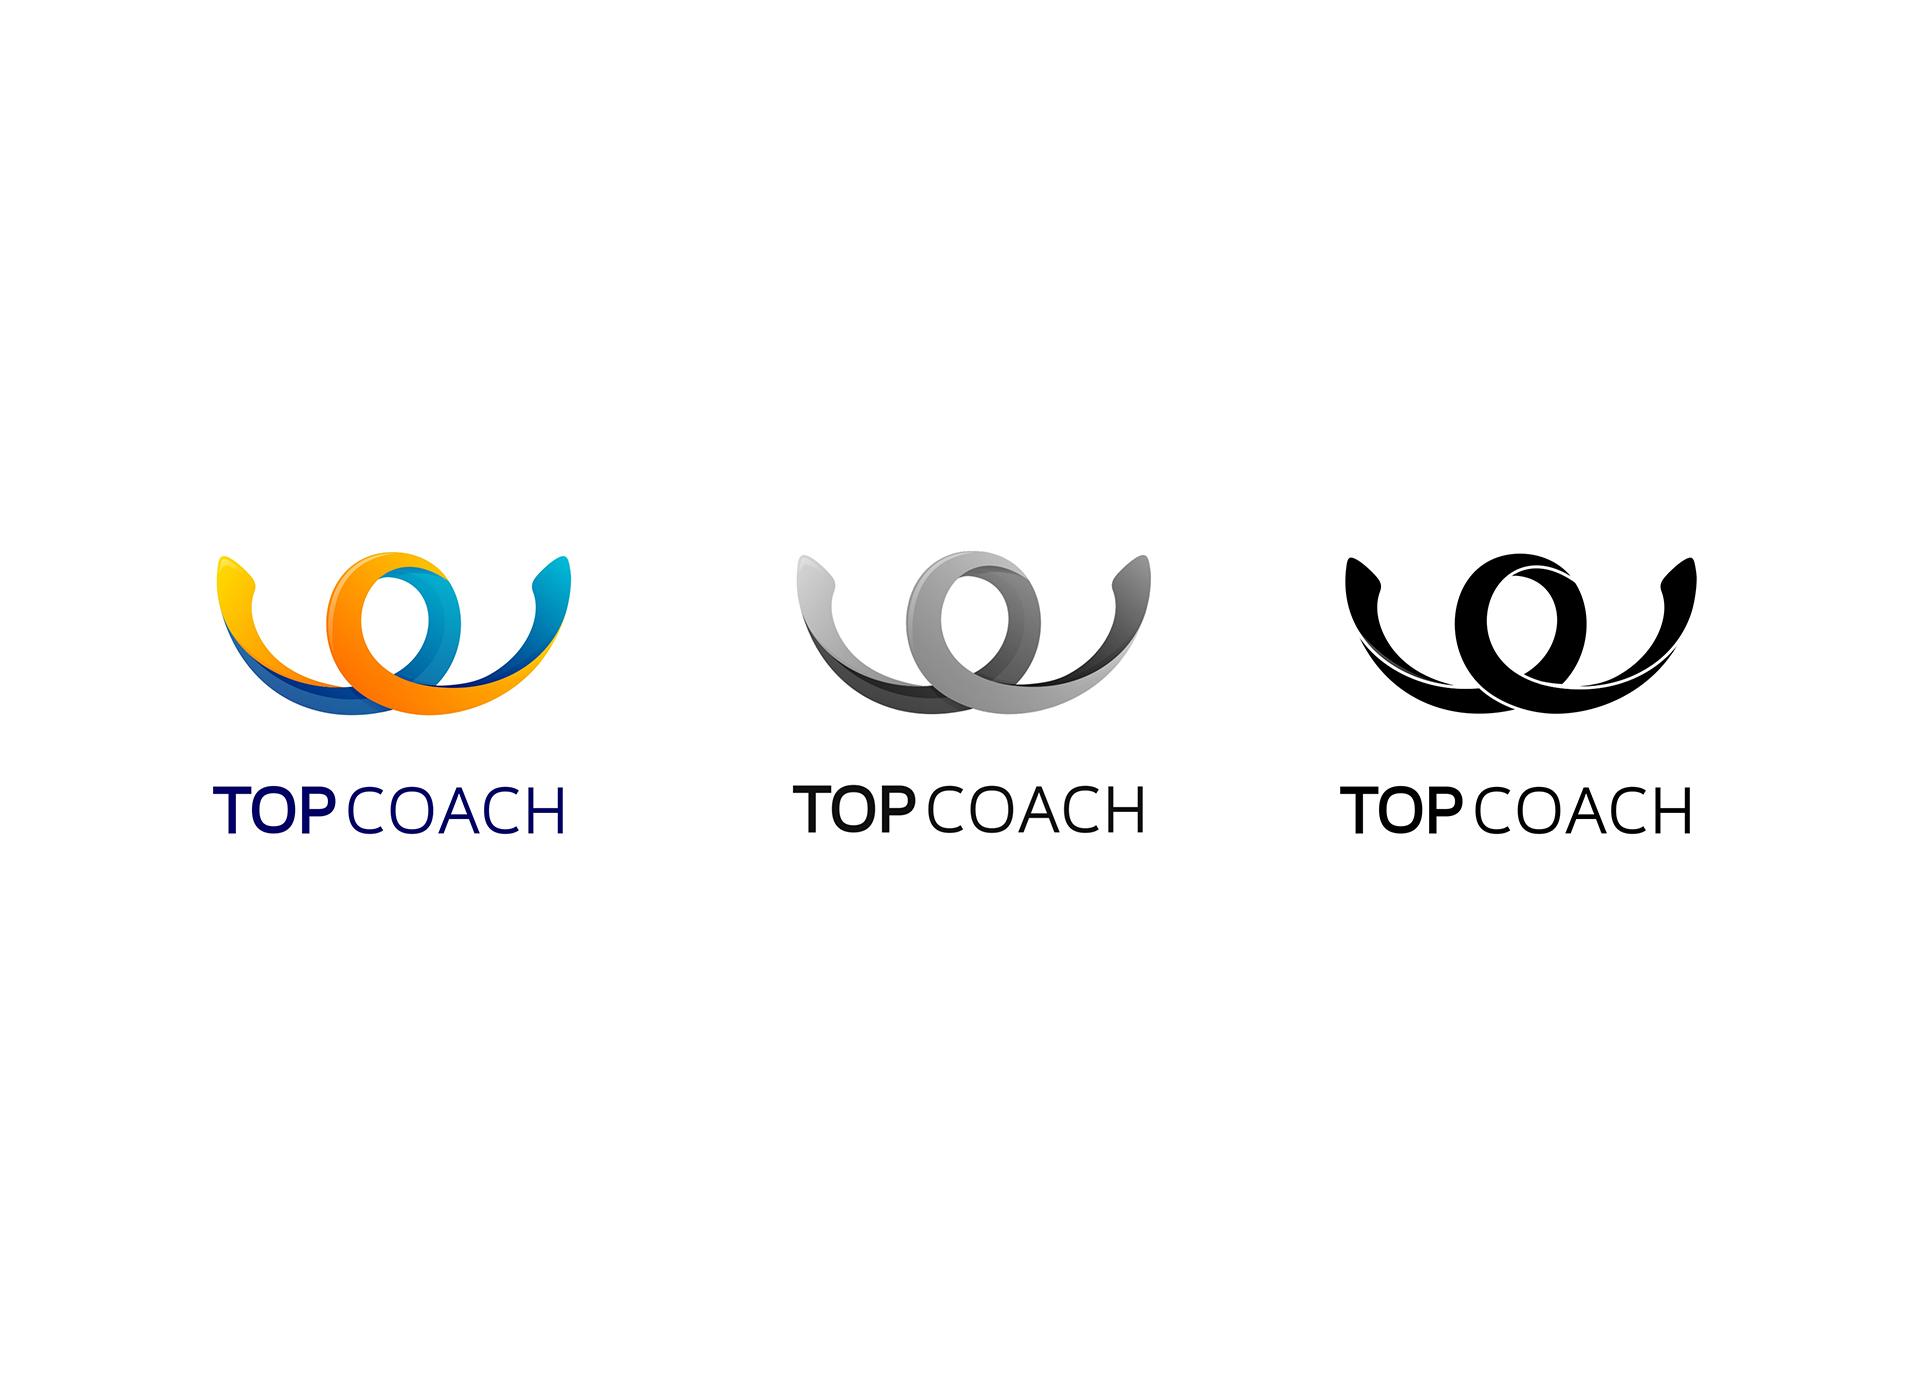 Top Coach portfolio inoveo logo variations